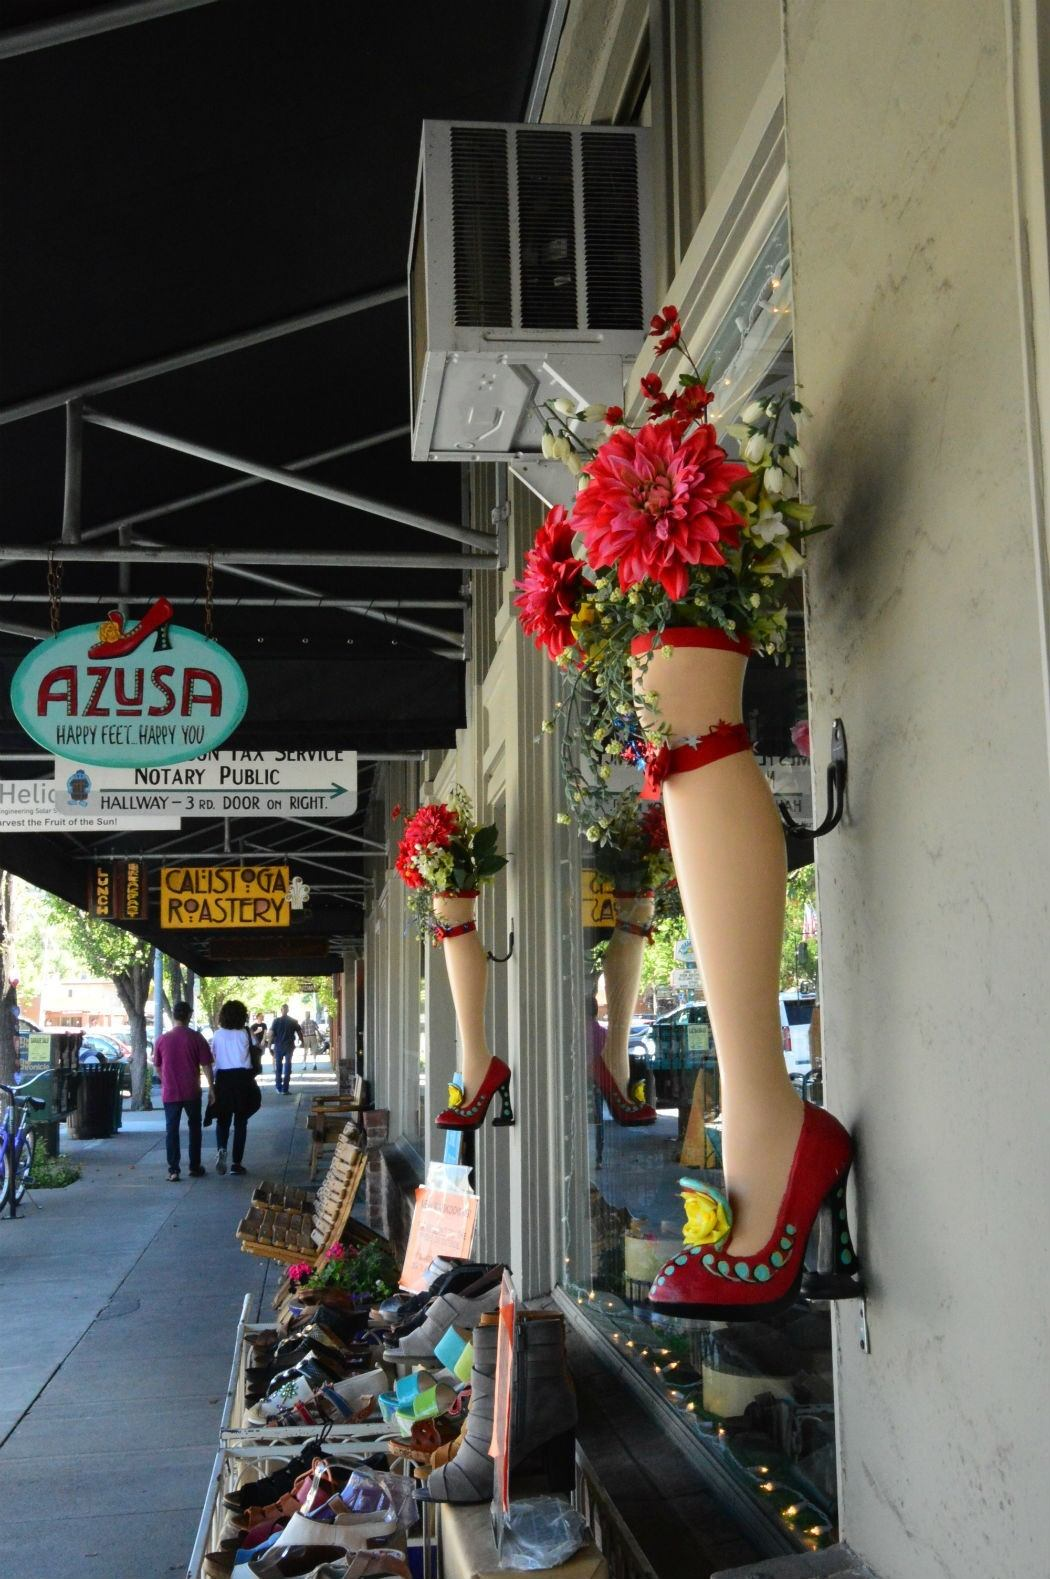 Shops on main street of Calistoga